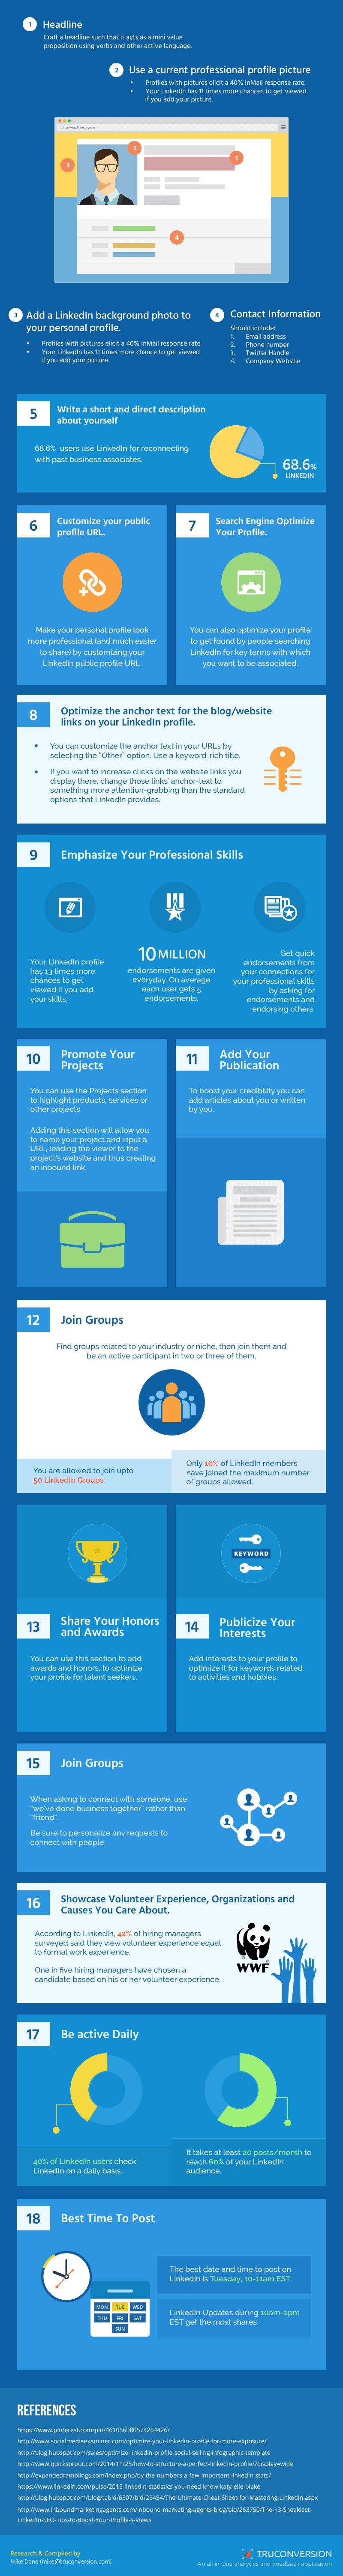 infographie profil linkedin